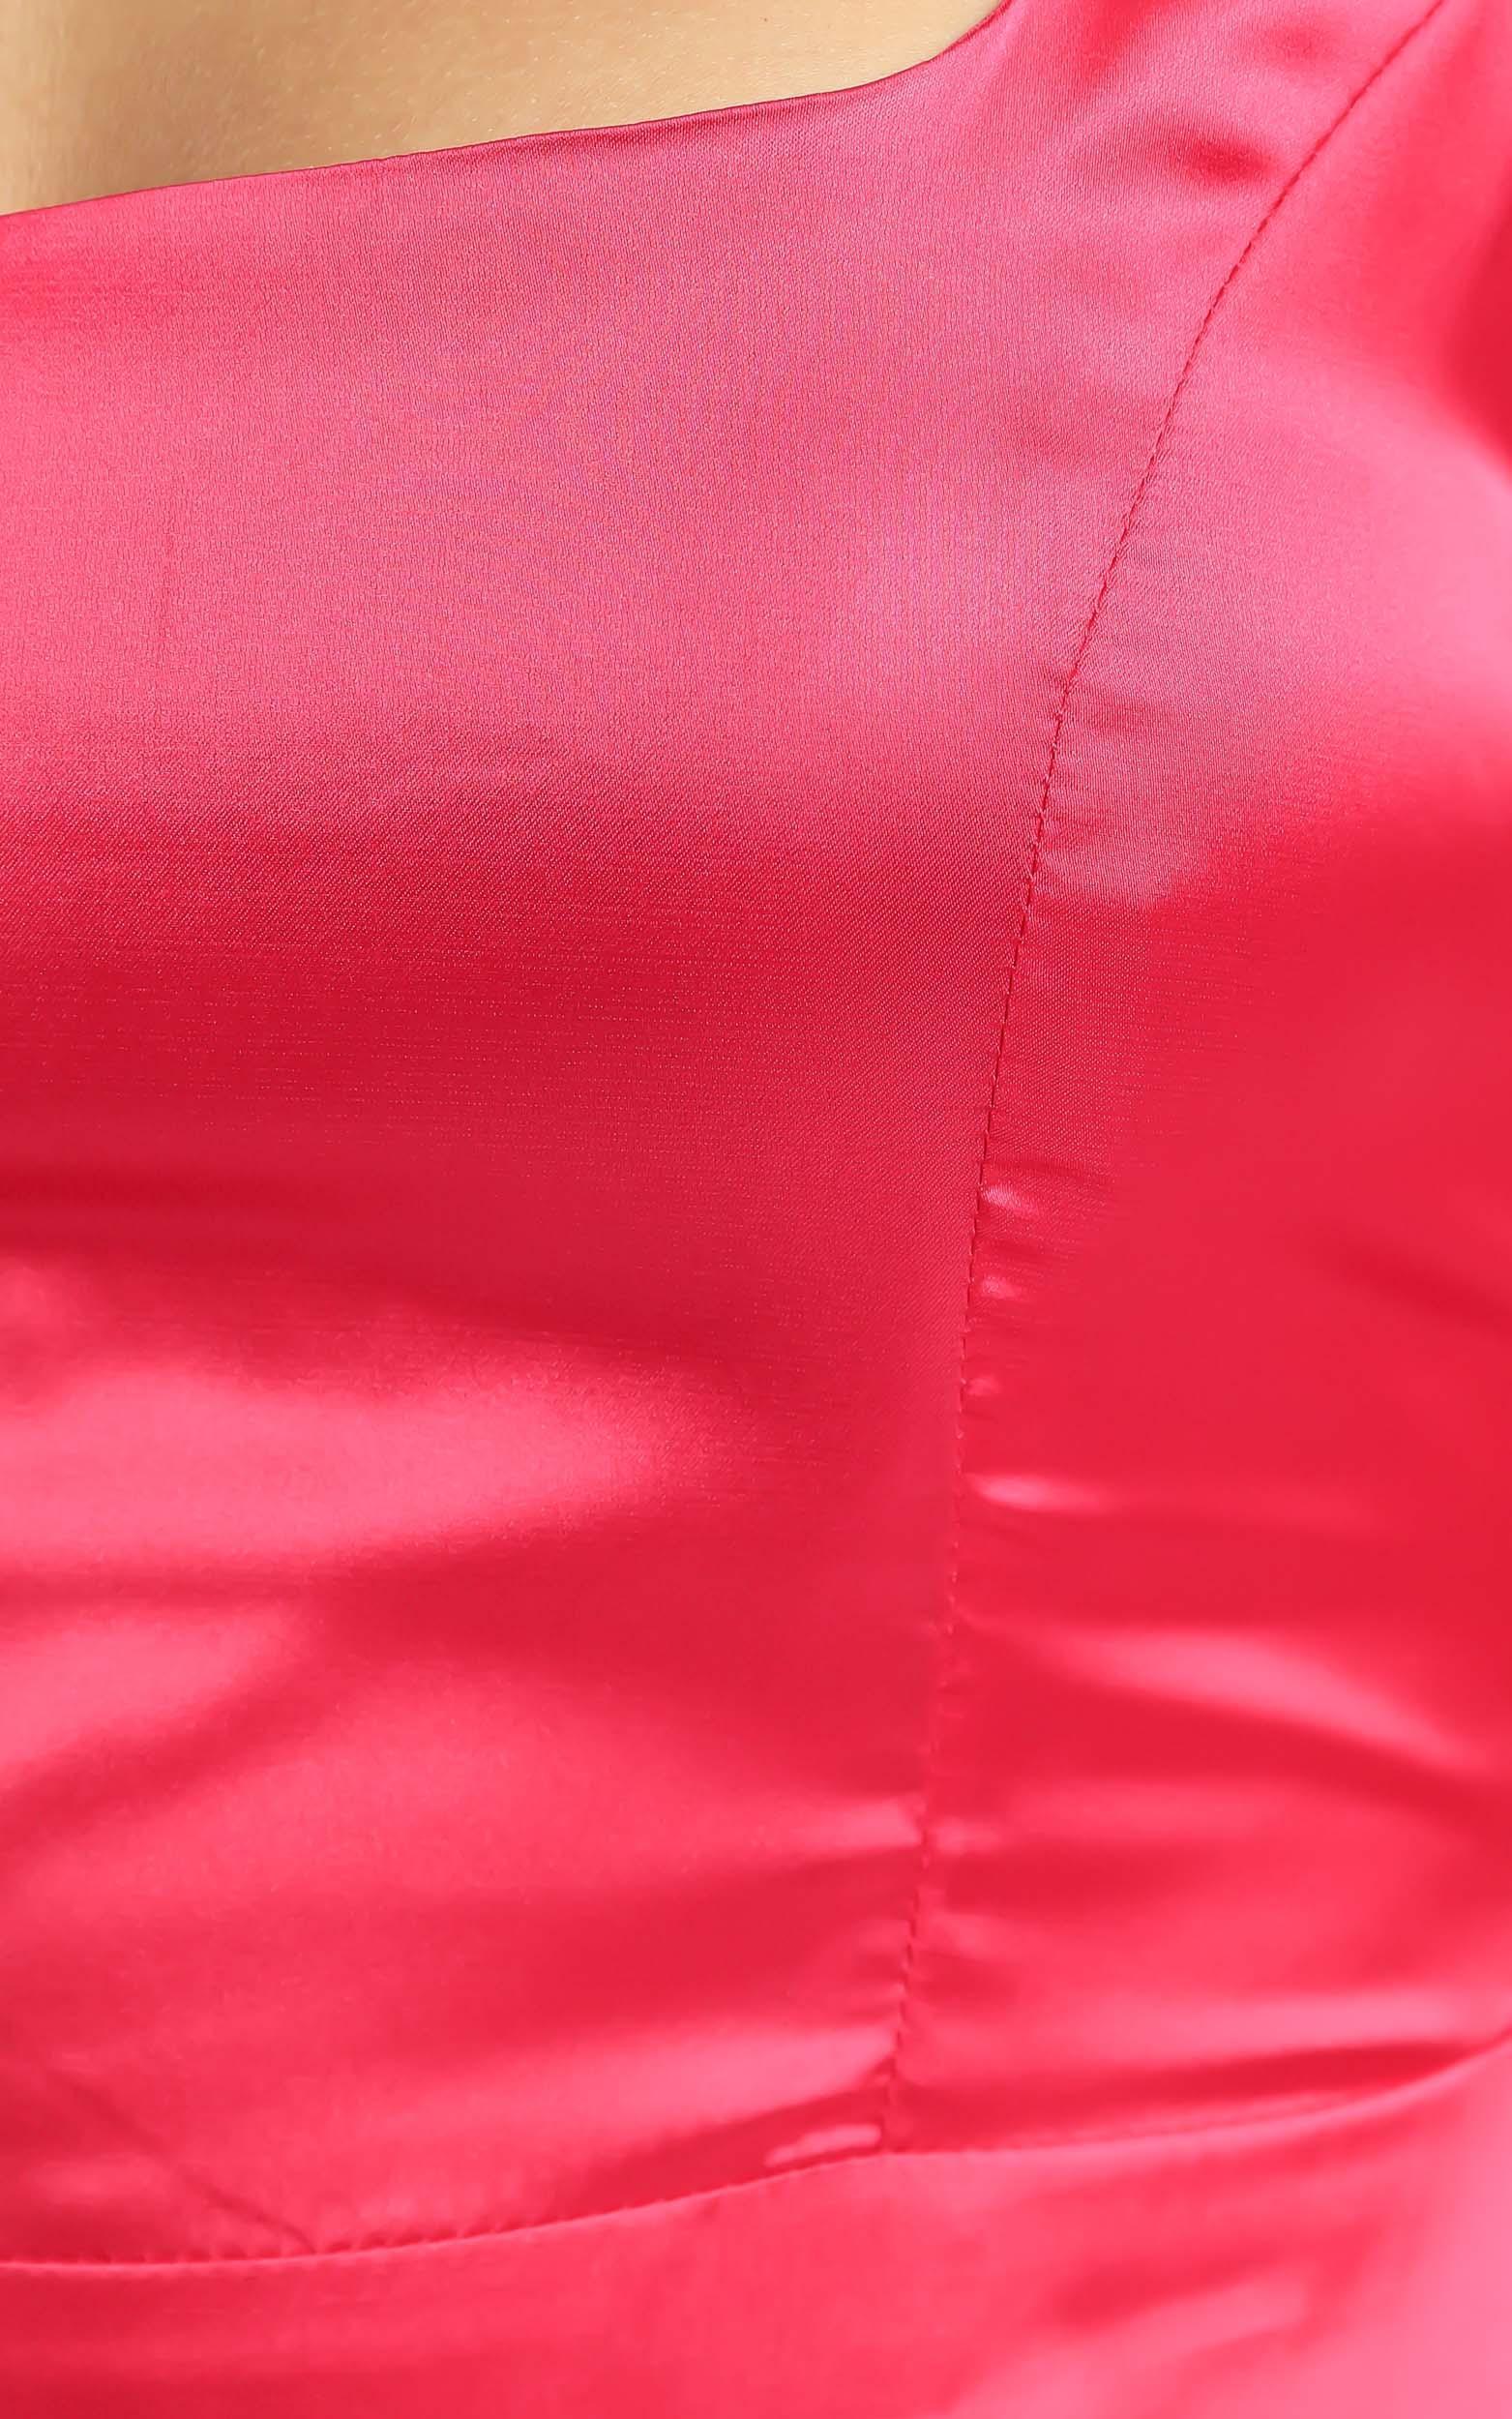 Sassa Dress in Hot Pink - 6 (XS), PNK11, hi-res image number null